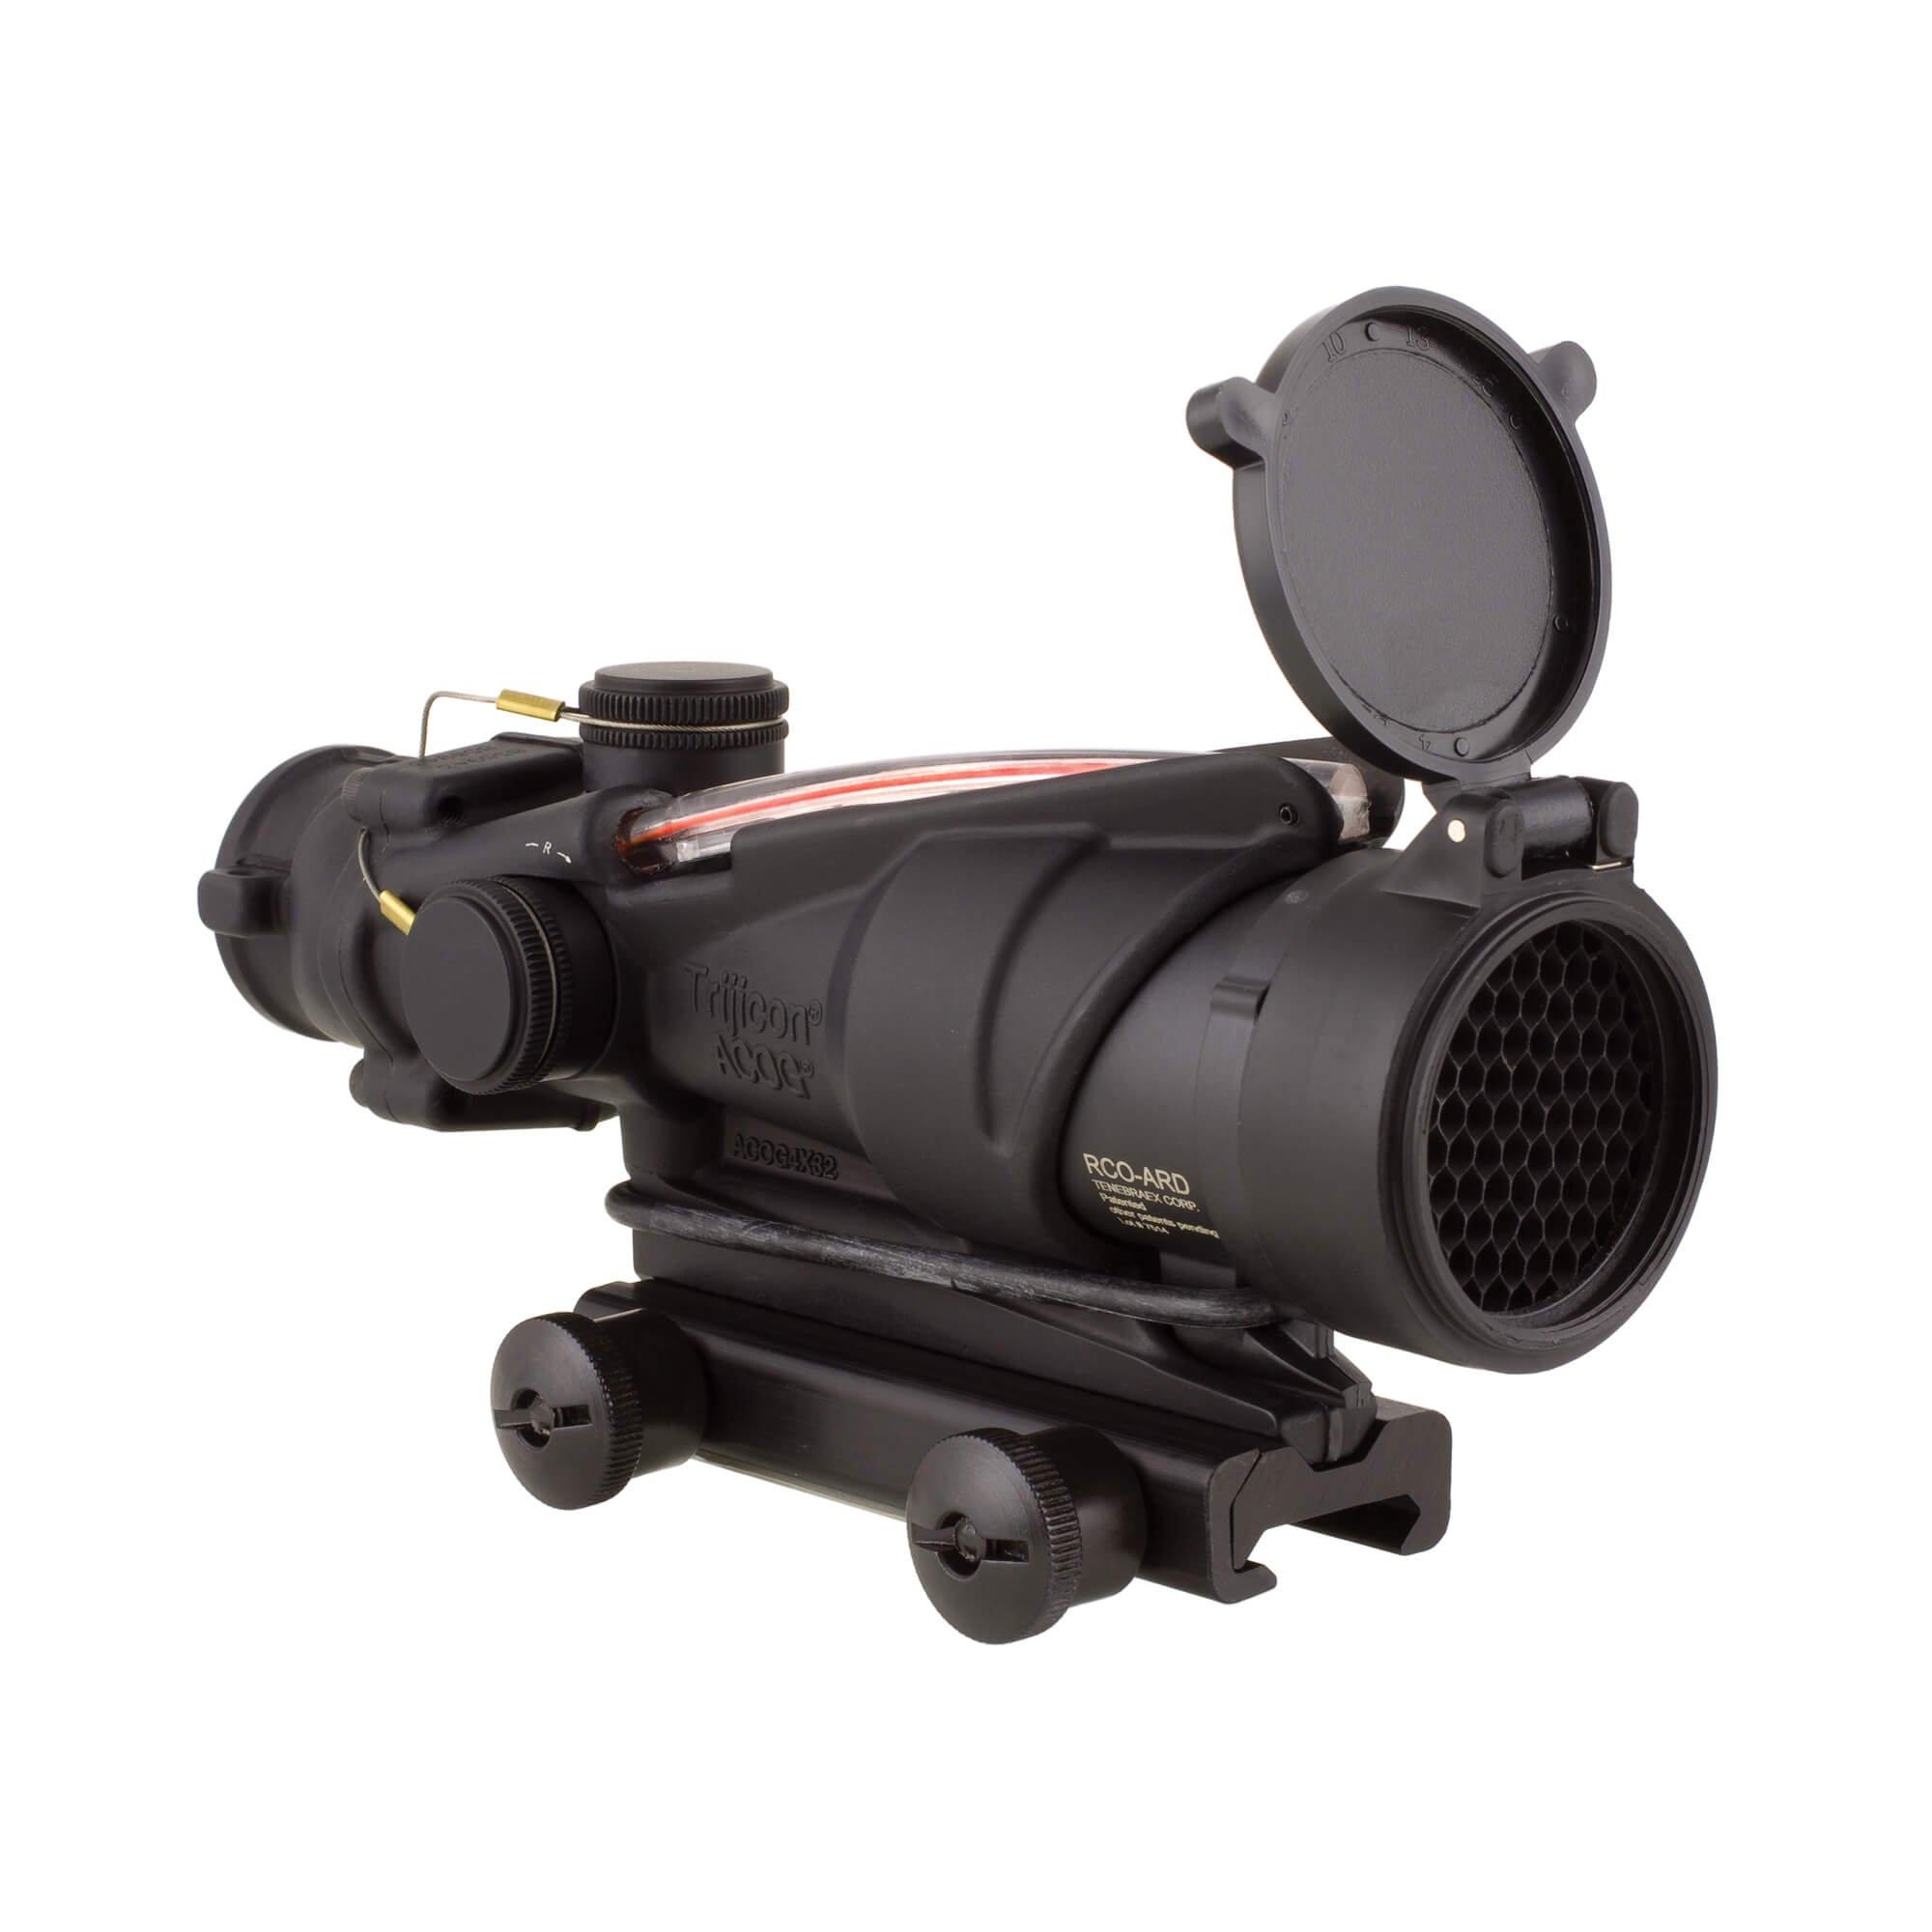 Trijicon ACOG 4 x 32 Army Rifle Combat Optic for M150